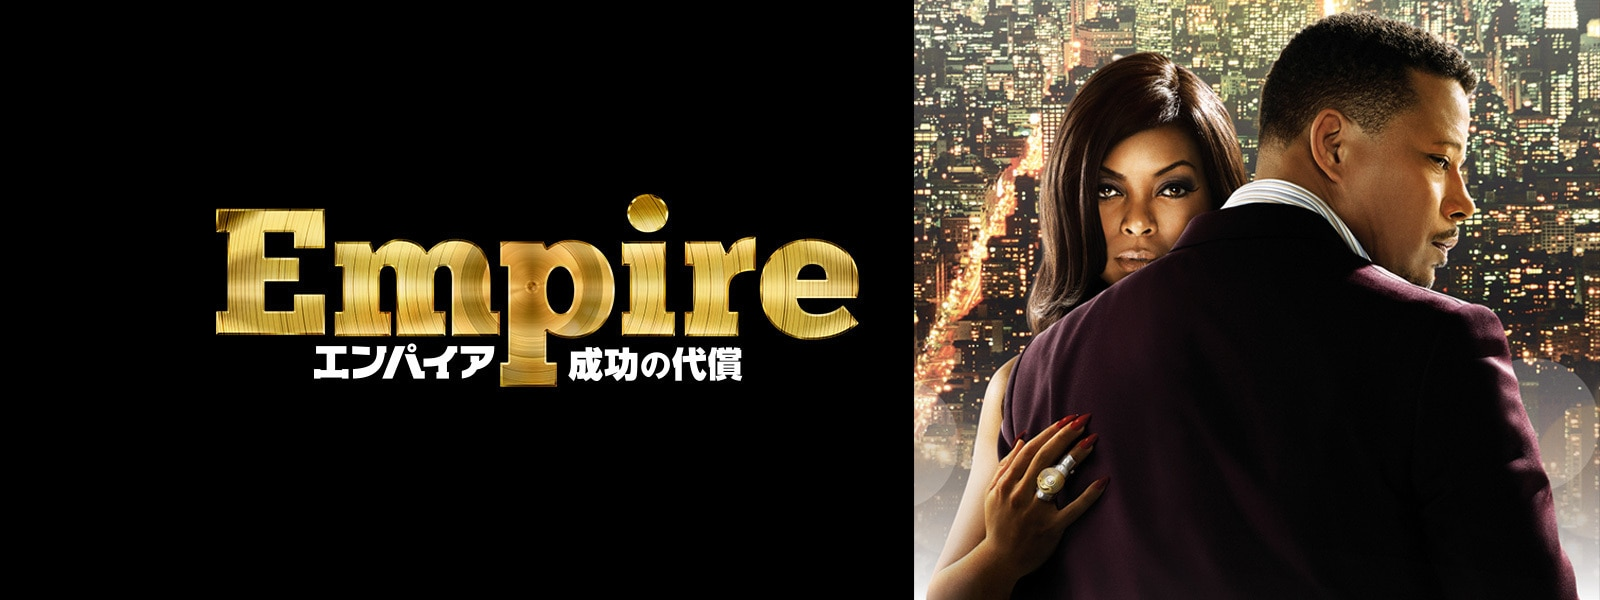 Empire/エンパイア 成功の代償|Empire Hero Object